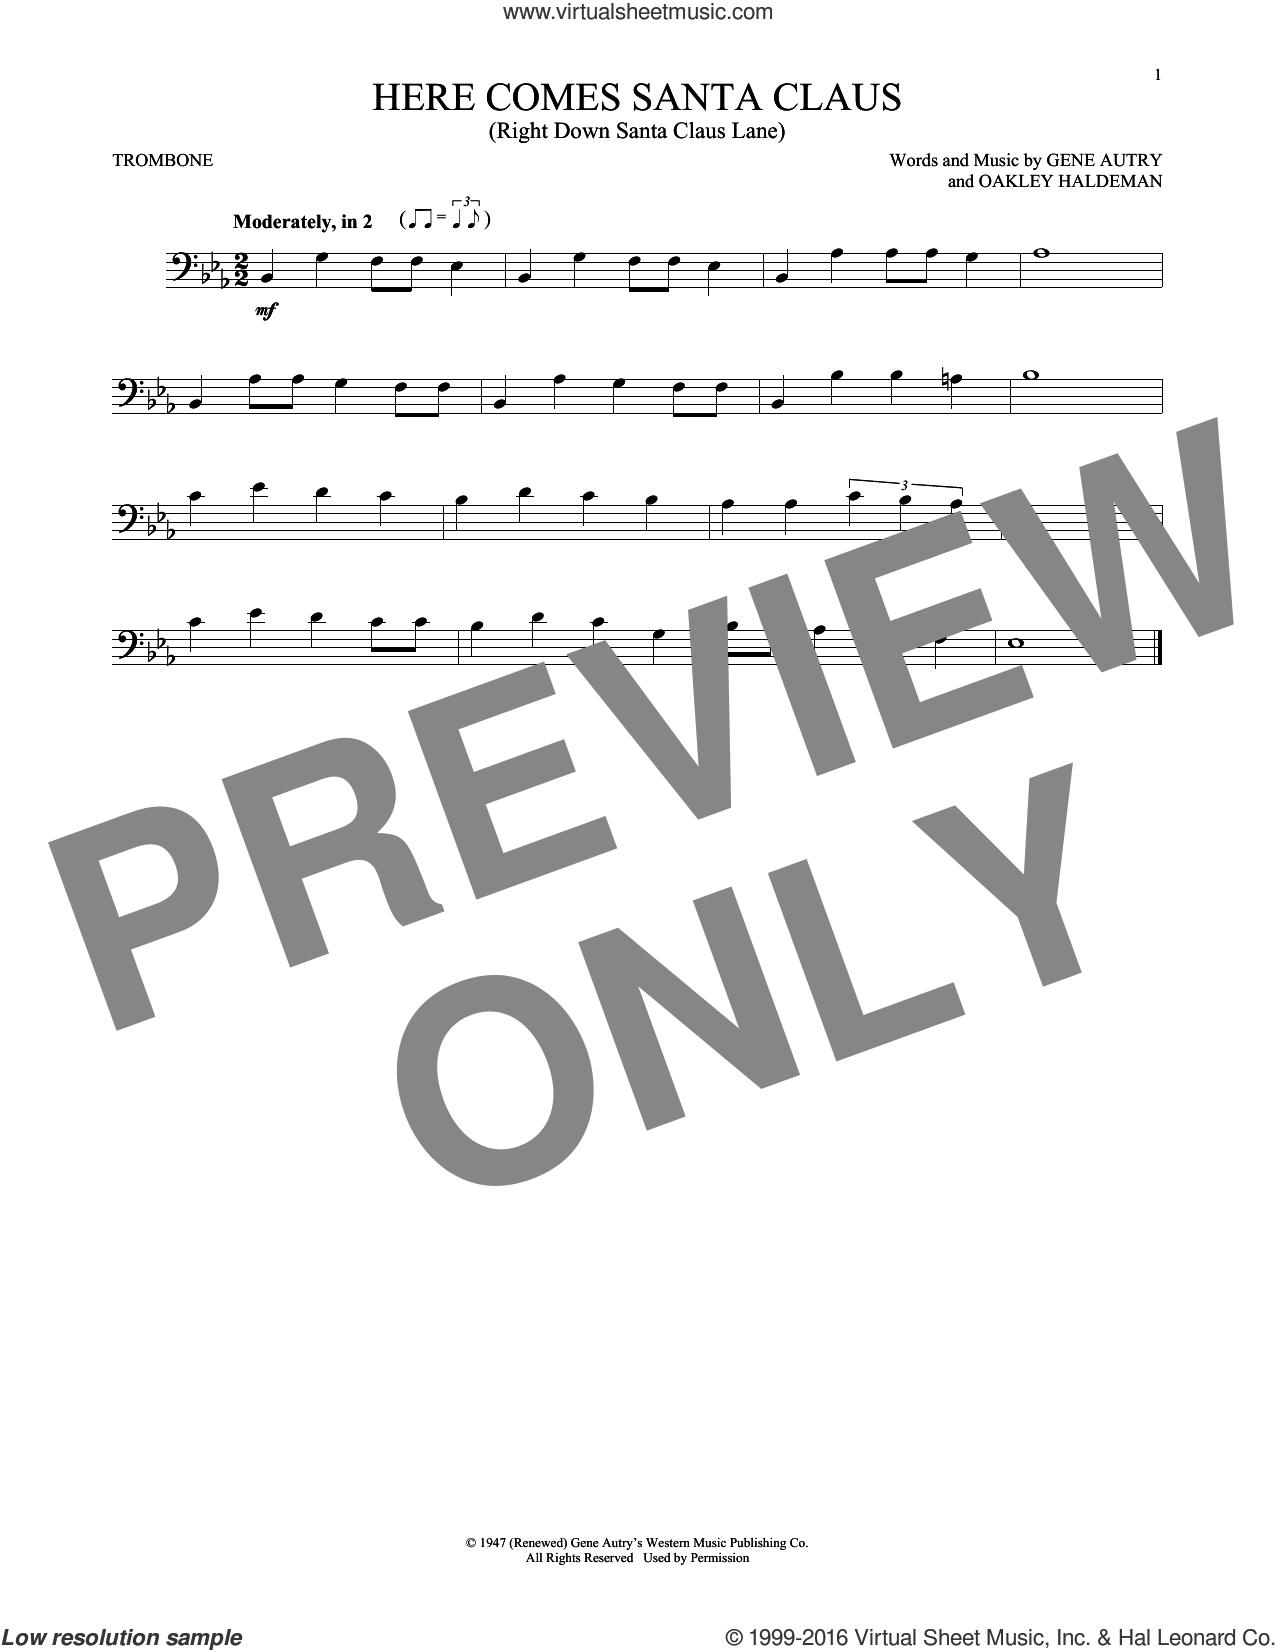 Here Comes Santa Claus (Right Down Santa Claus Lane) sheet music for trombone solo by Gene Autry, Carpenters and Oakley Haldeman, intermediate skill level